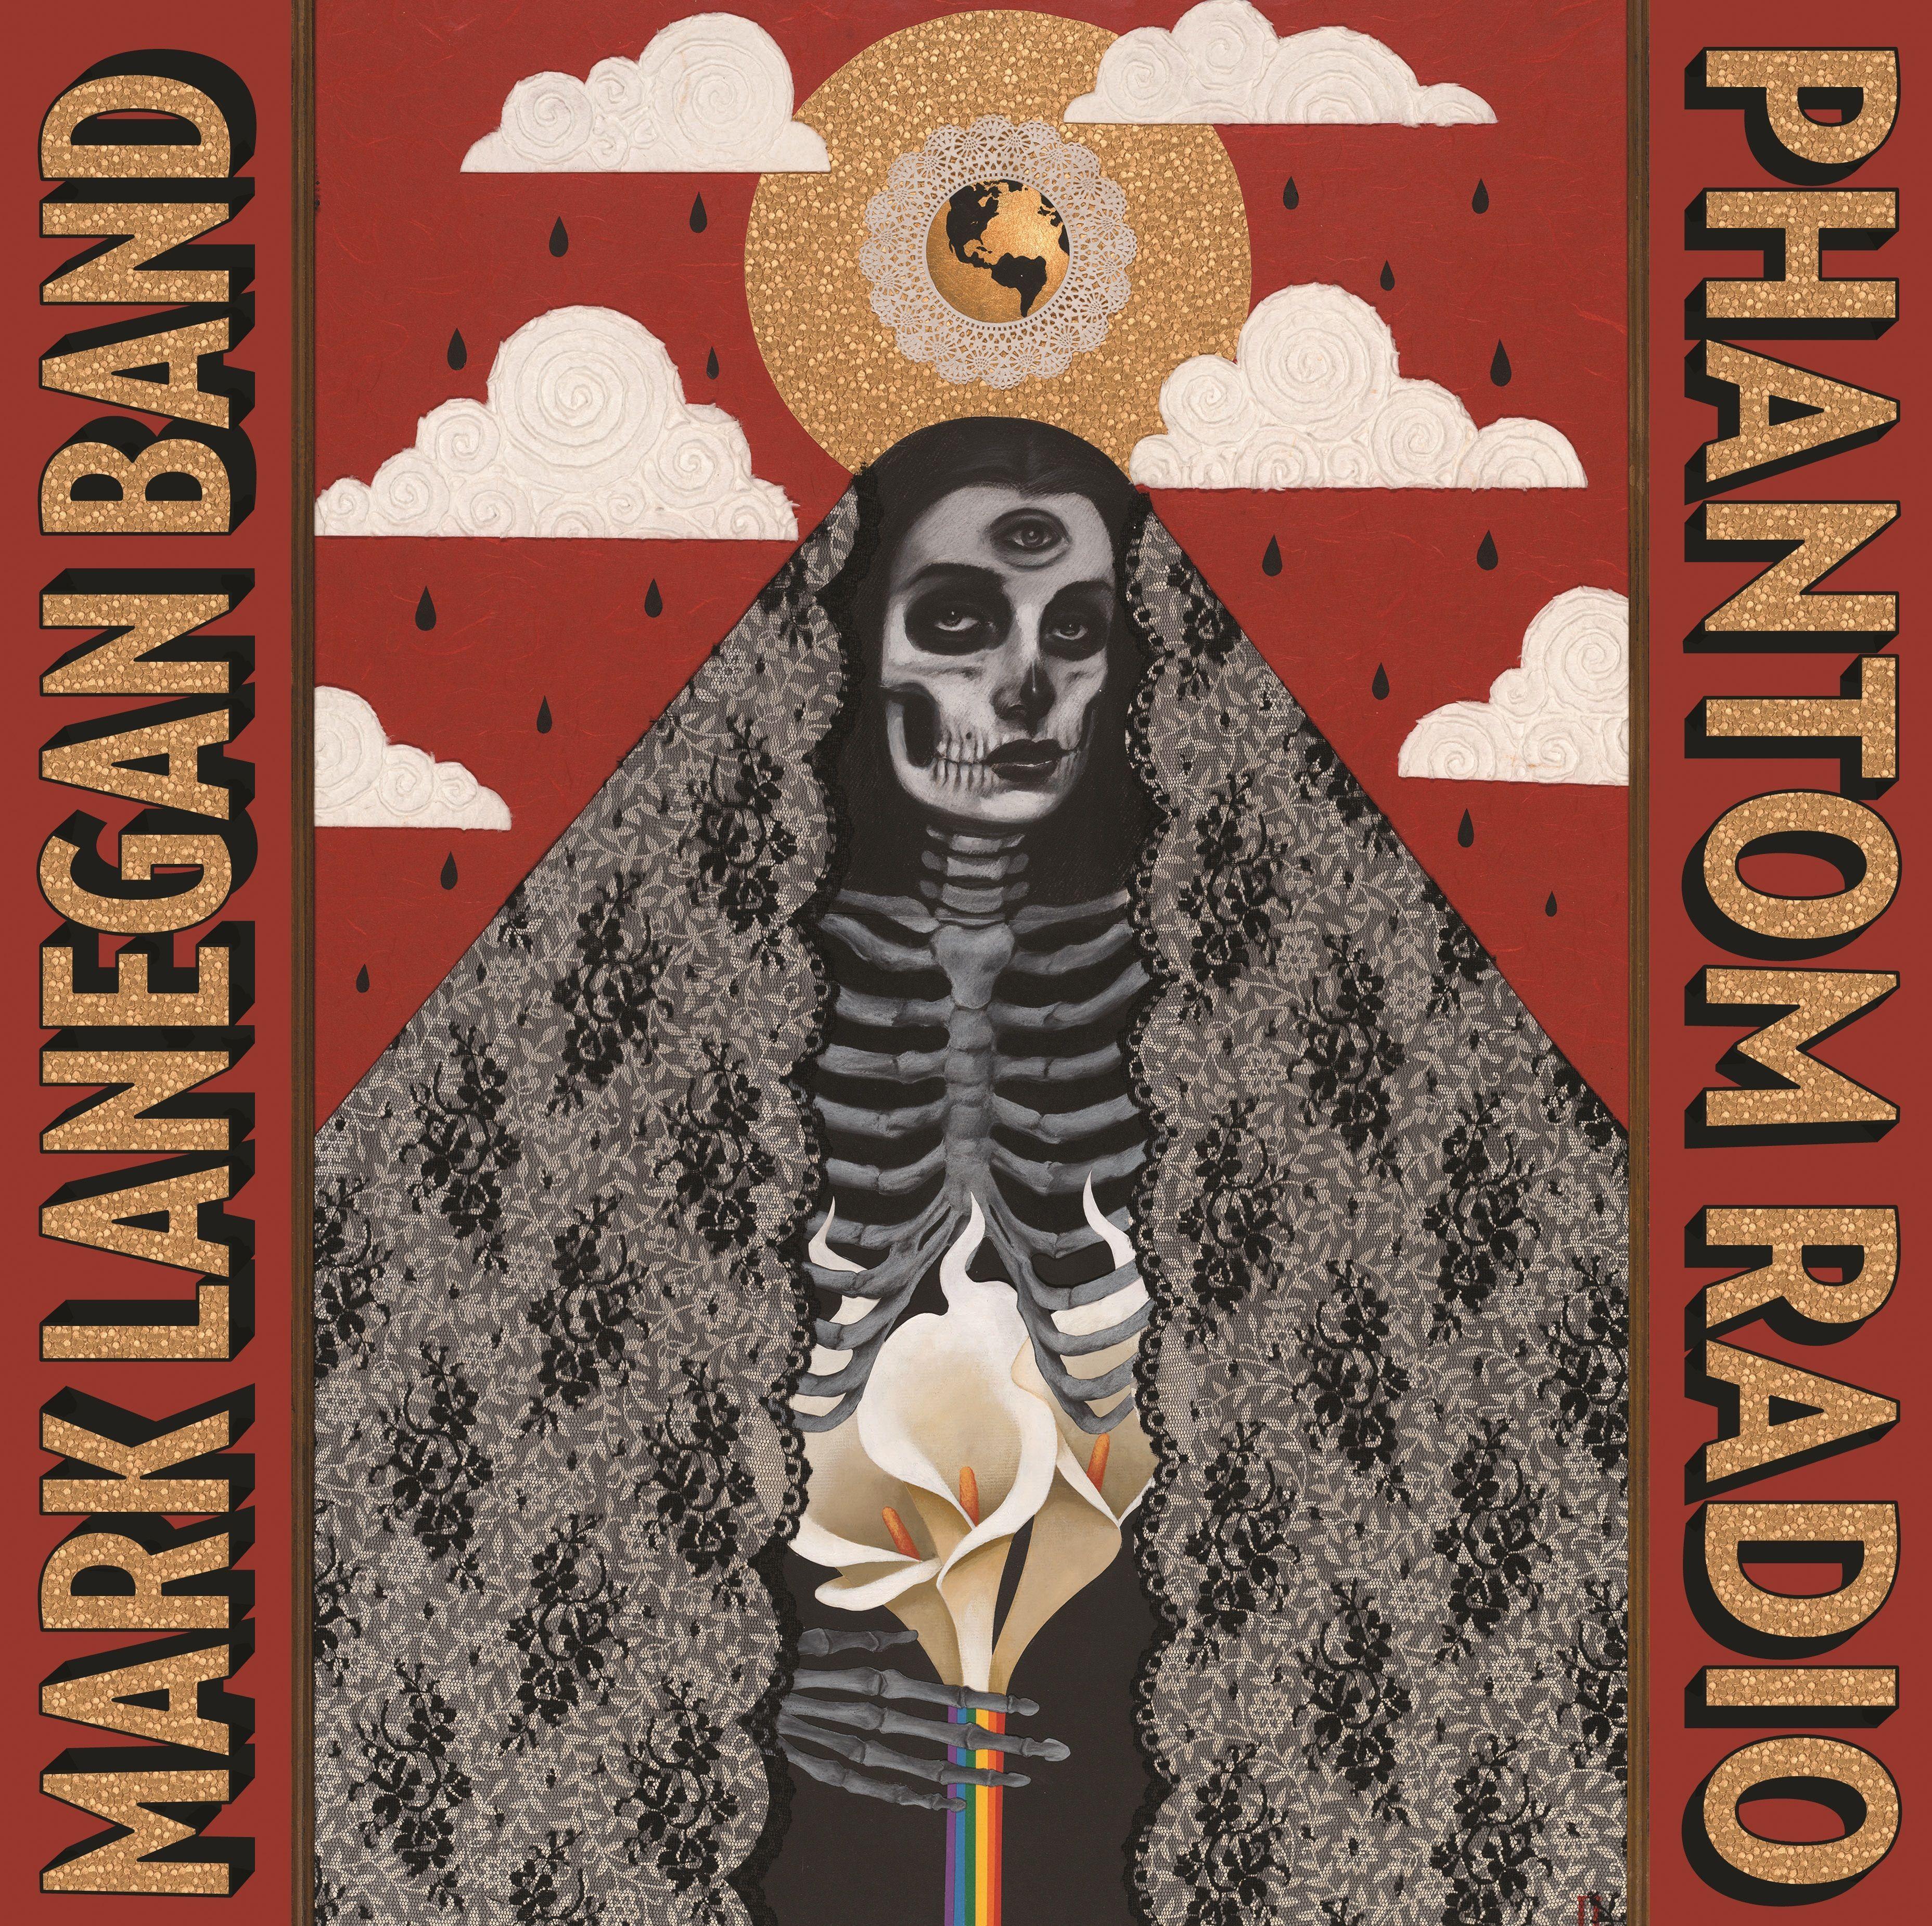 Phantom Radio White Vinyl Mark Lanegan Records Lps Rock Artists